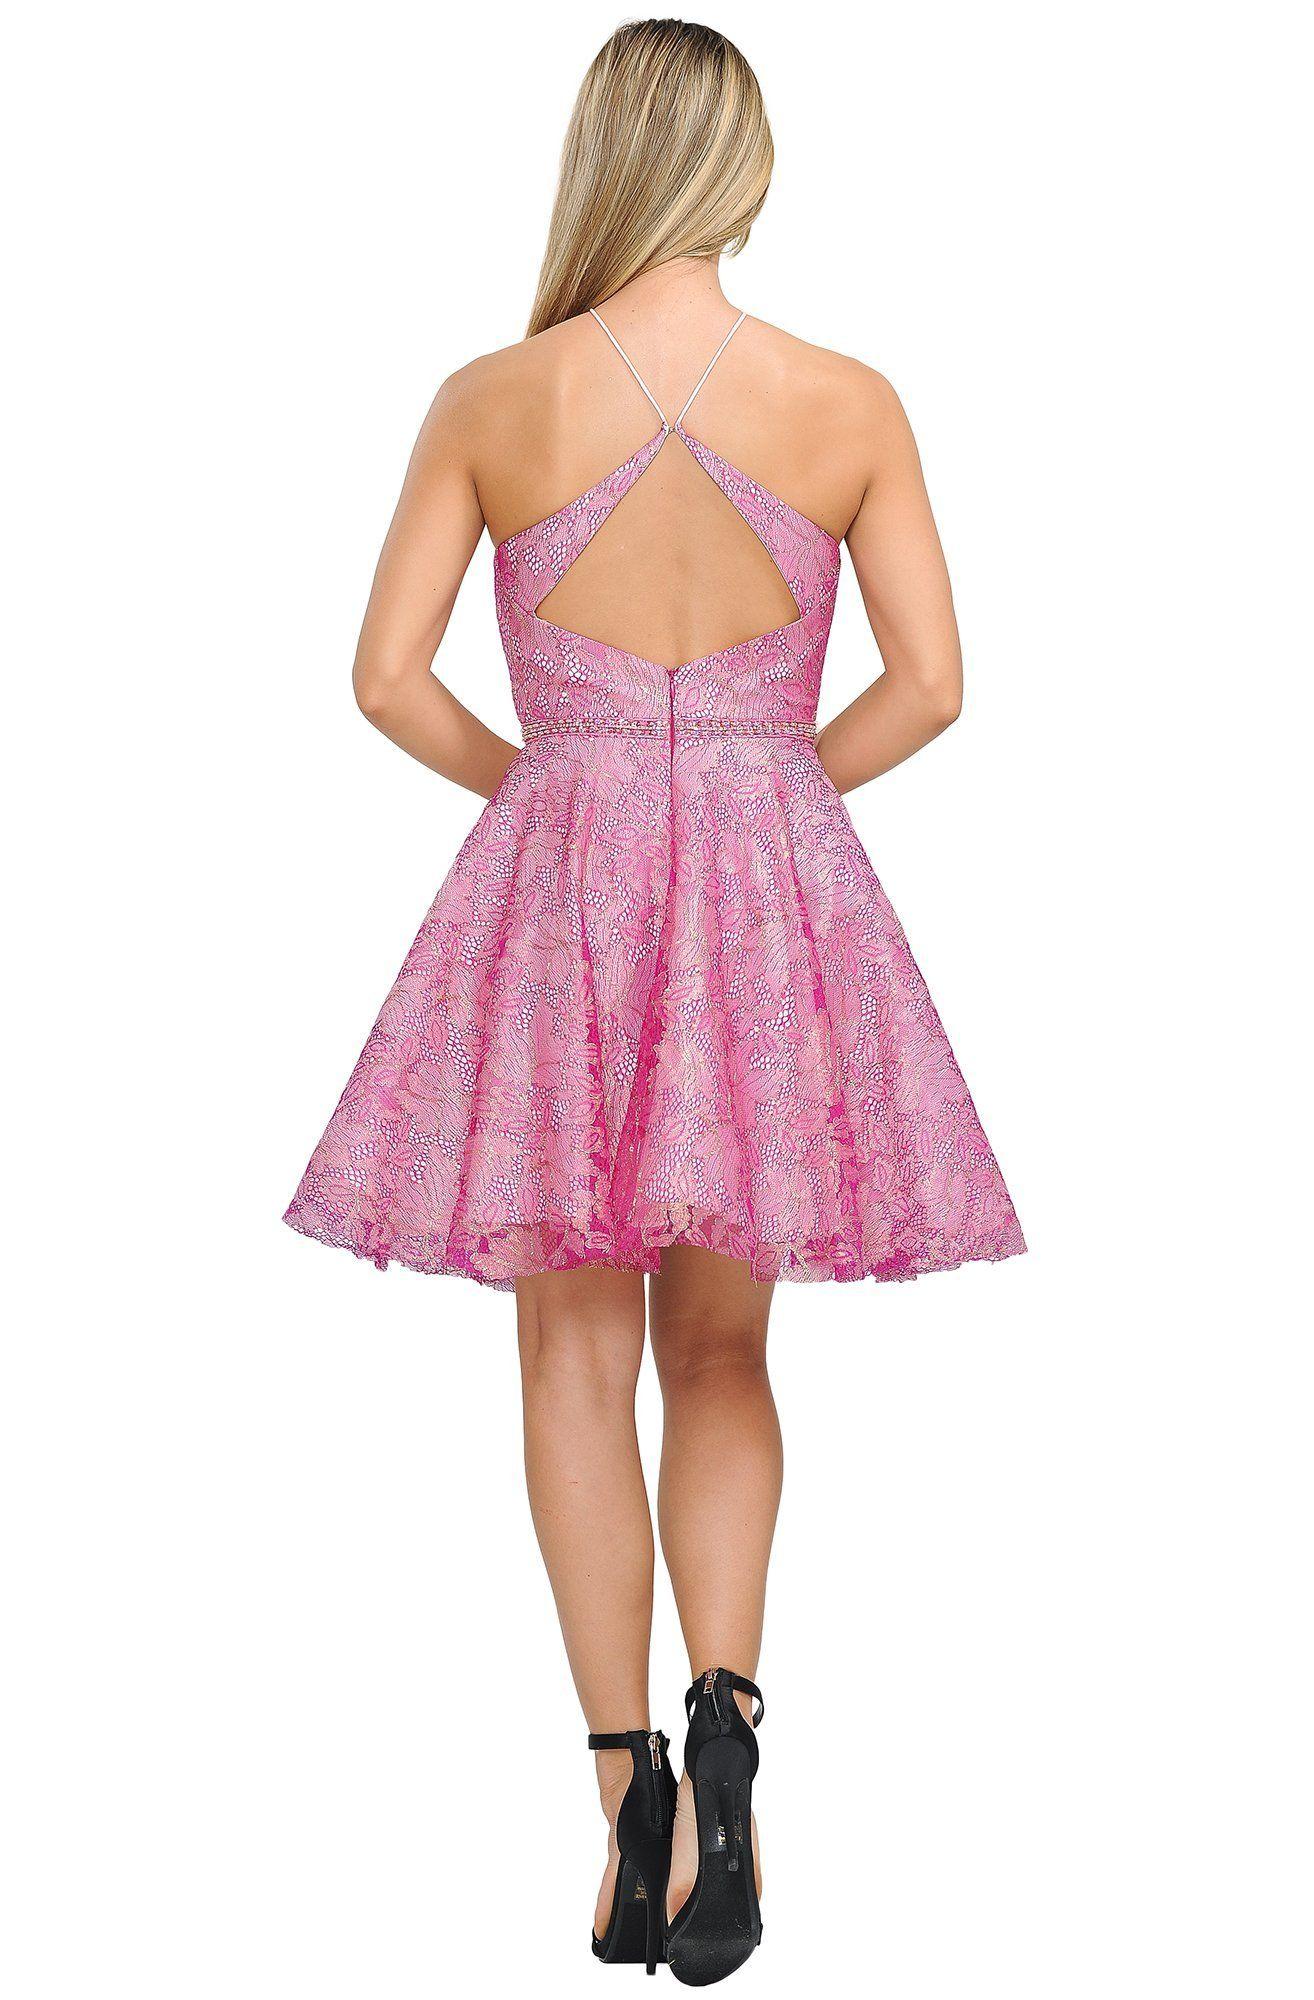 Poly USA - 8506 Halter Neck A-line Cocktail Dress #backlesscocktaildress